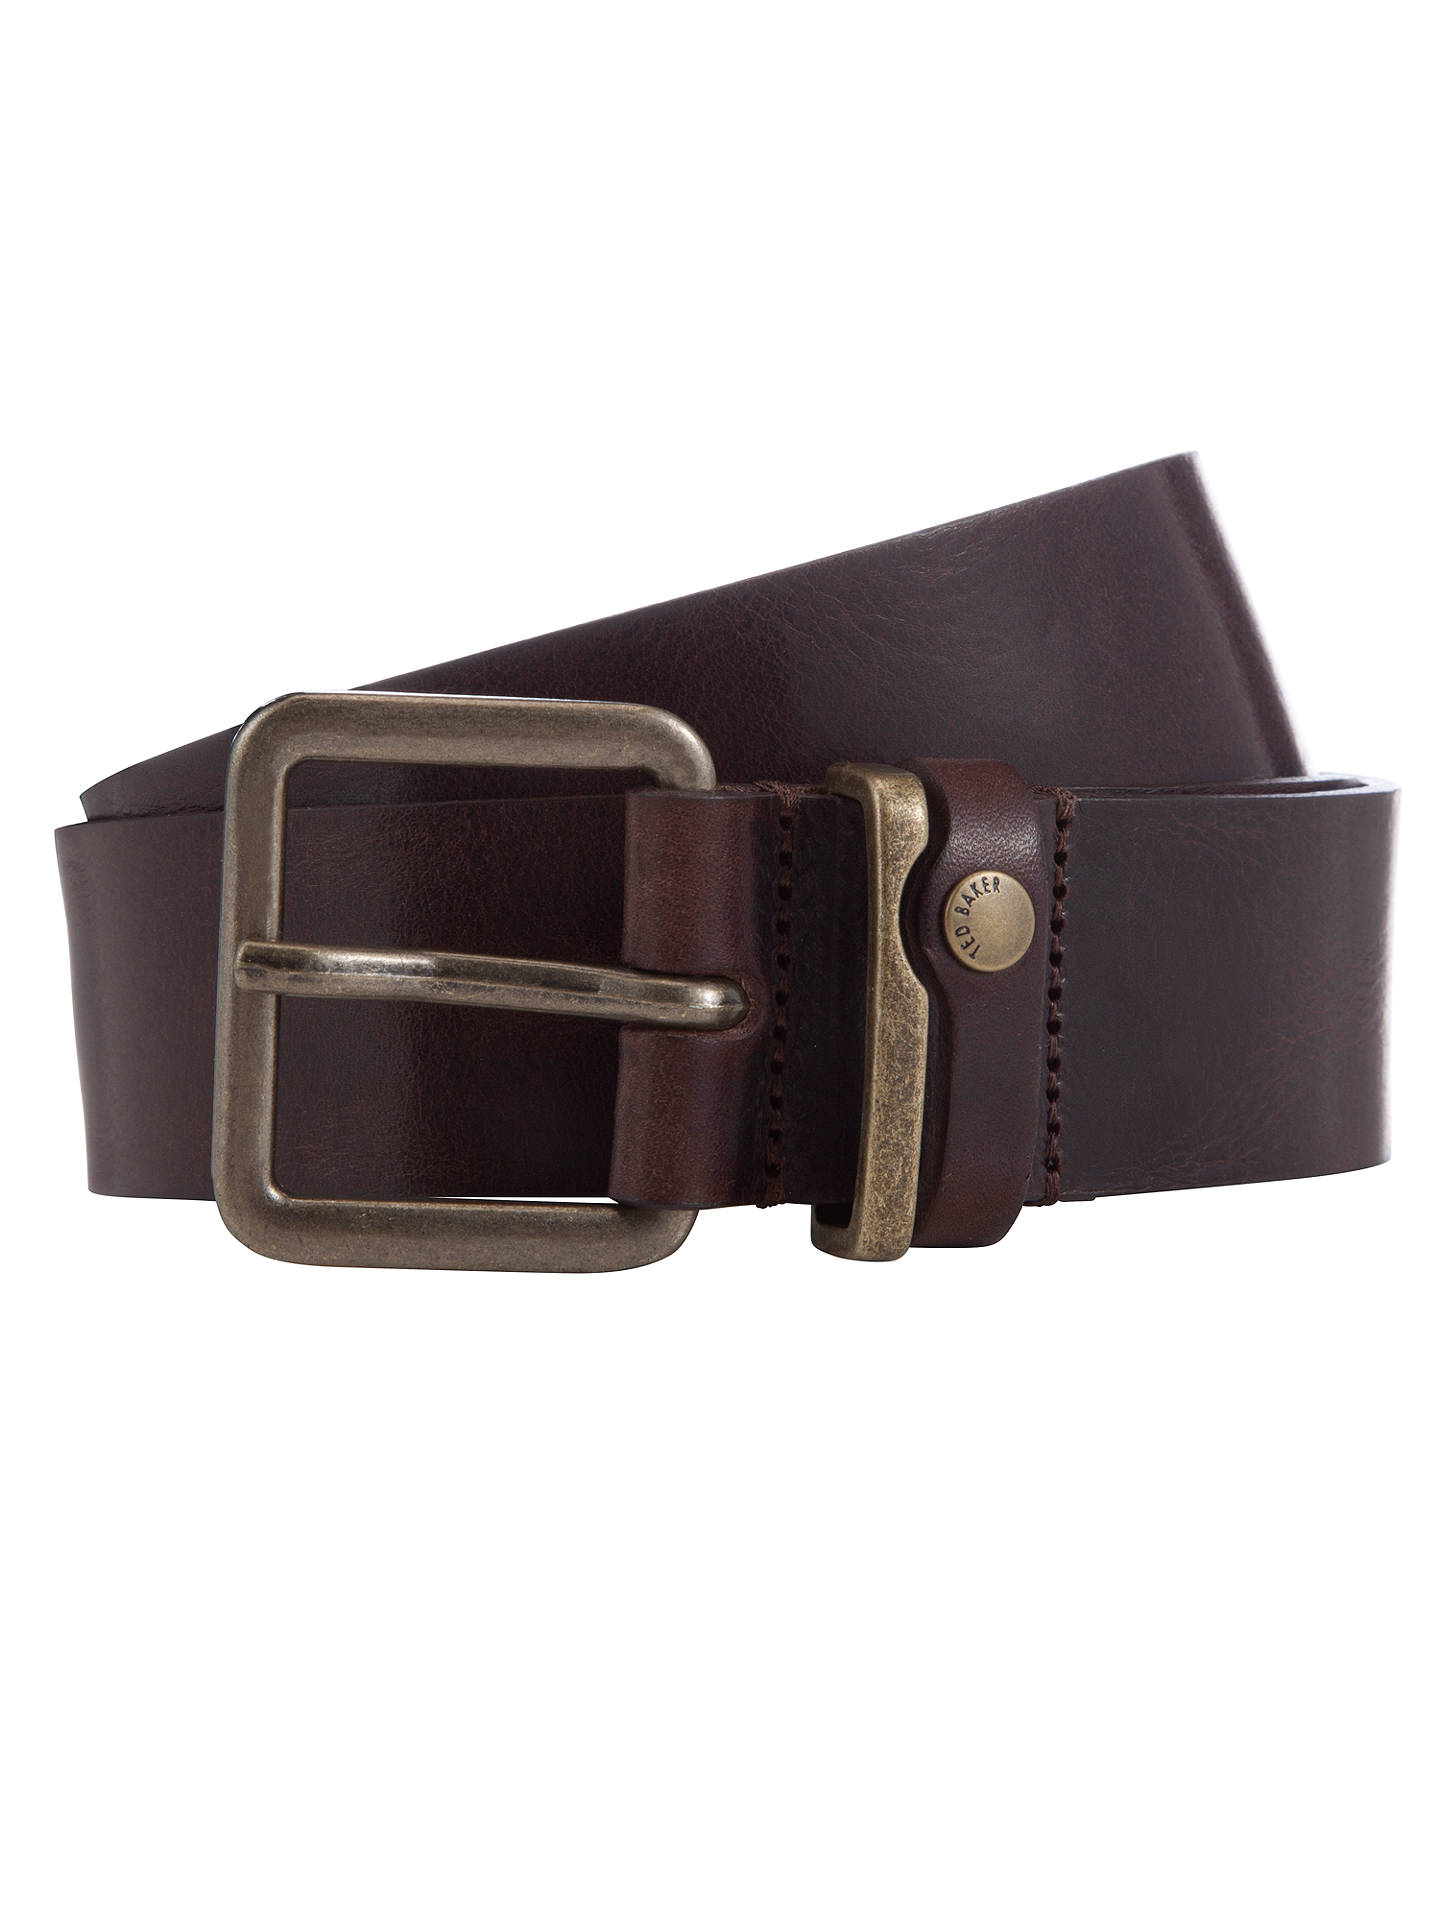 d47e106ff Buy Ted Baker Katchup Leather Belt